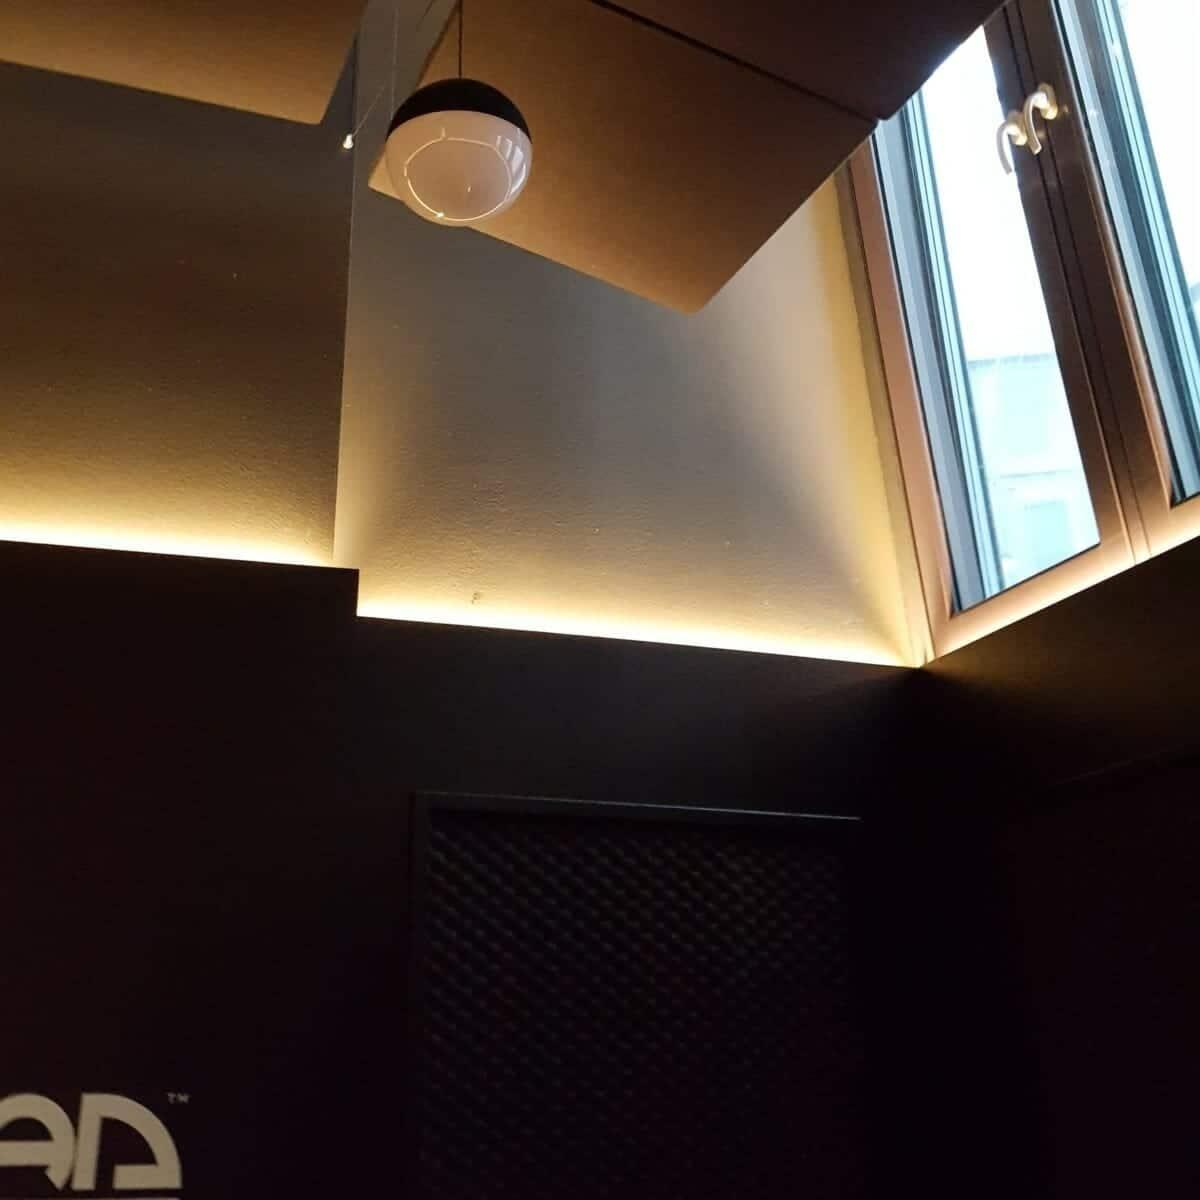 No Need Song Dj Punjab Com Download: Støydemping Er Viktig For Et Bra Innemiljø! Se Wall-it.no